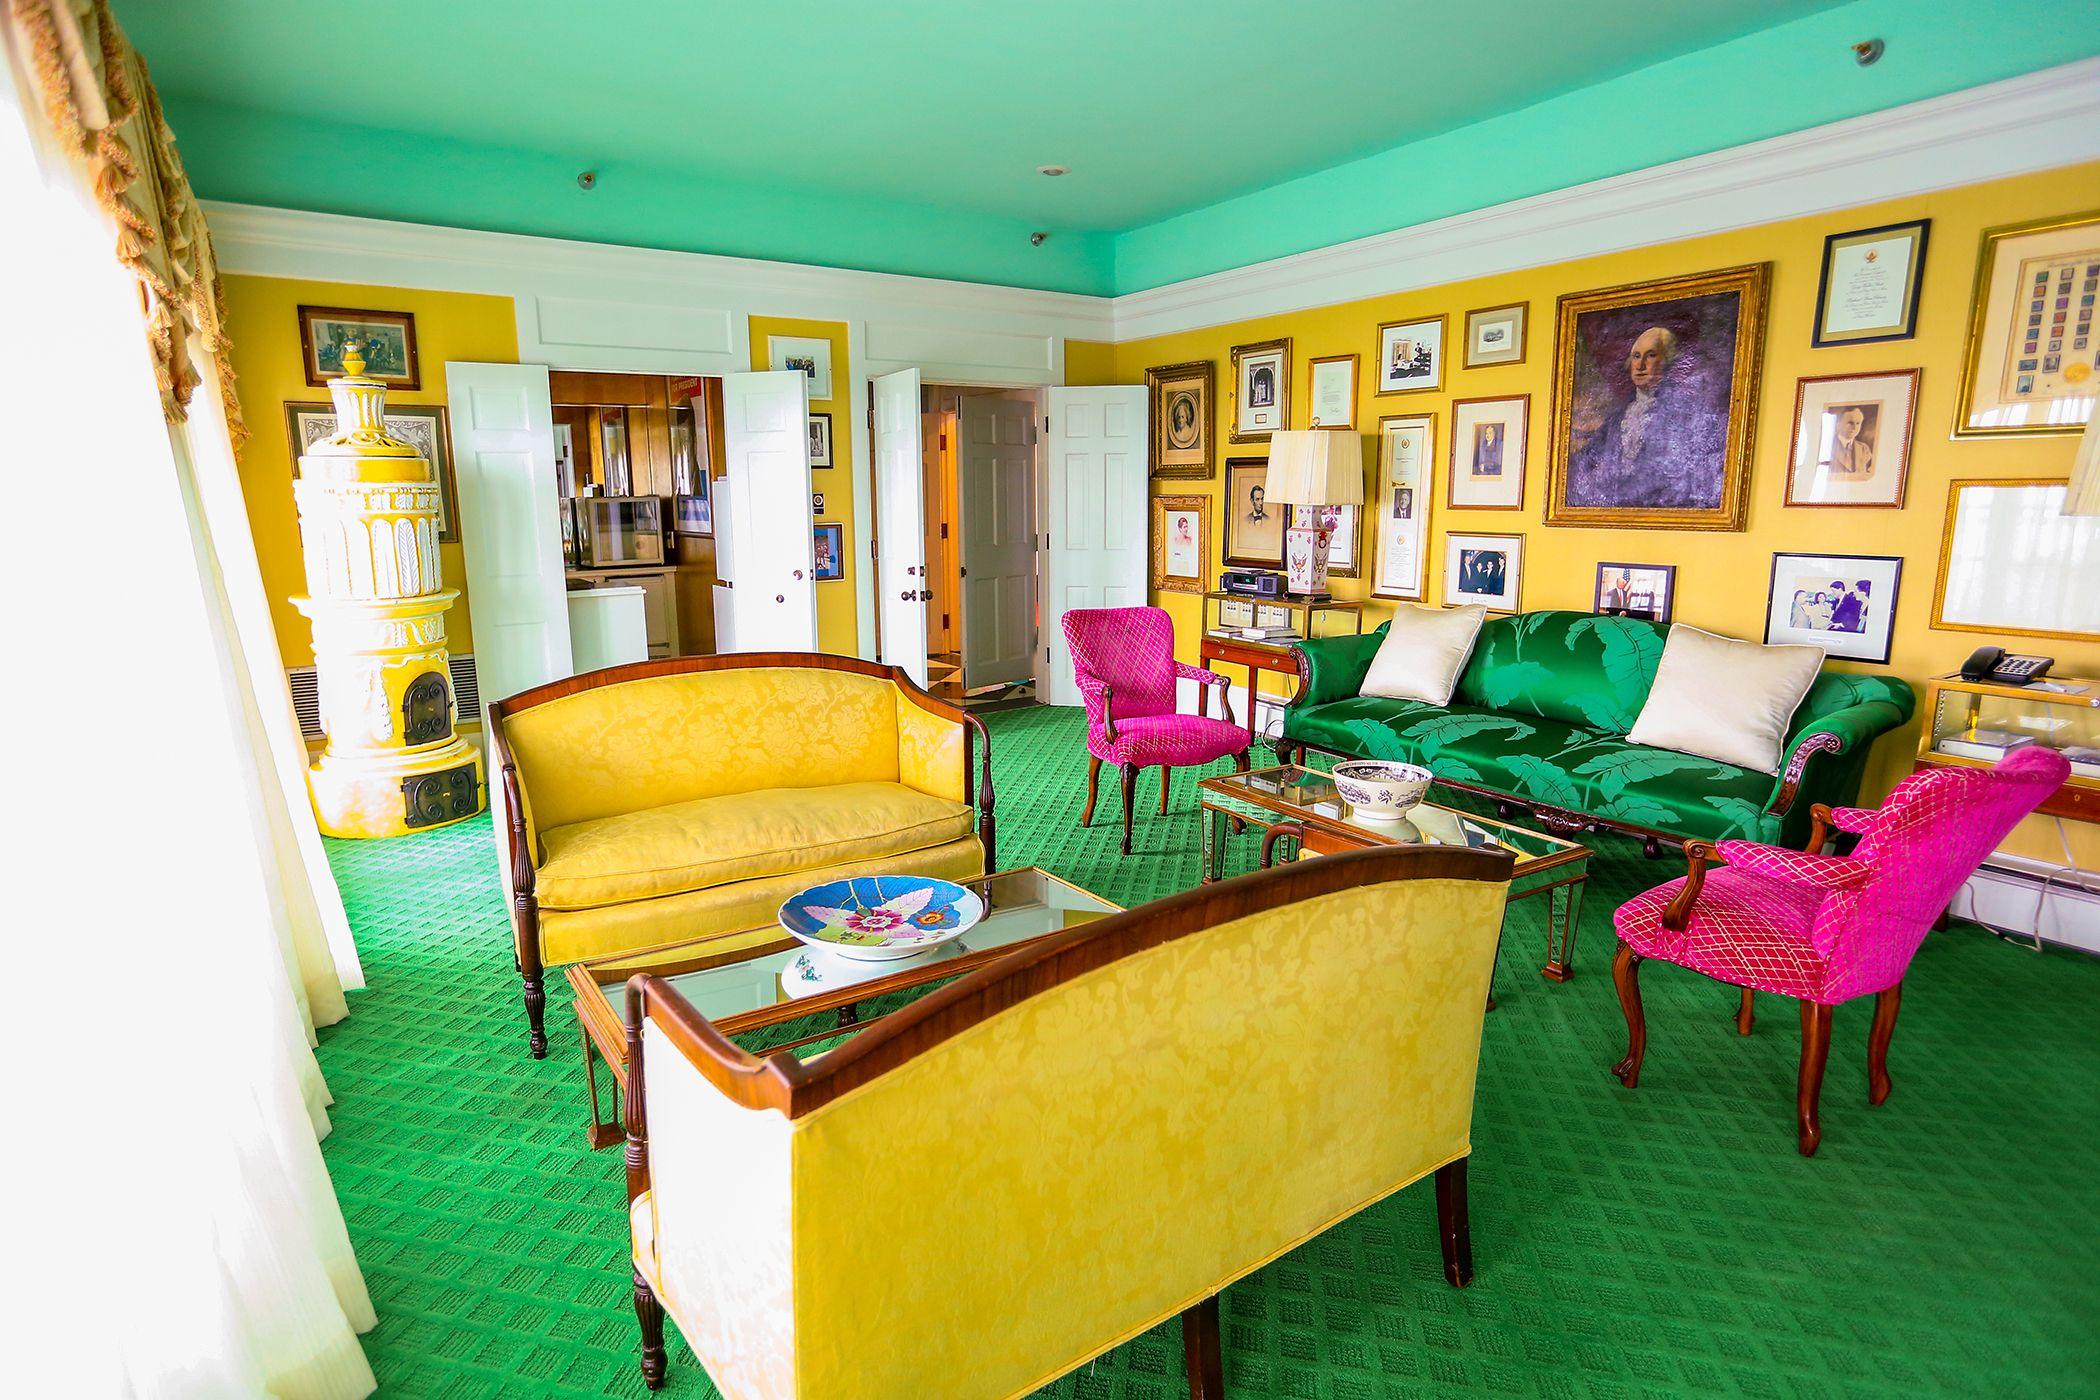 Grand Hotel Presidential Suite Grandhotel Mackinacisland Presidential Suite Grandhotelmichigan Grand Hotel Mackinac Island Grand Hotel Mackinac Island